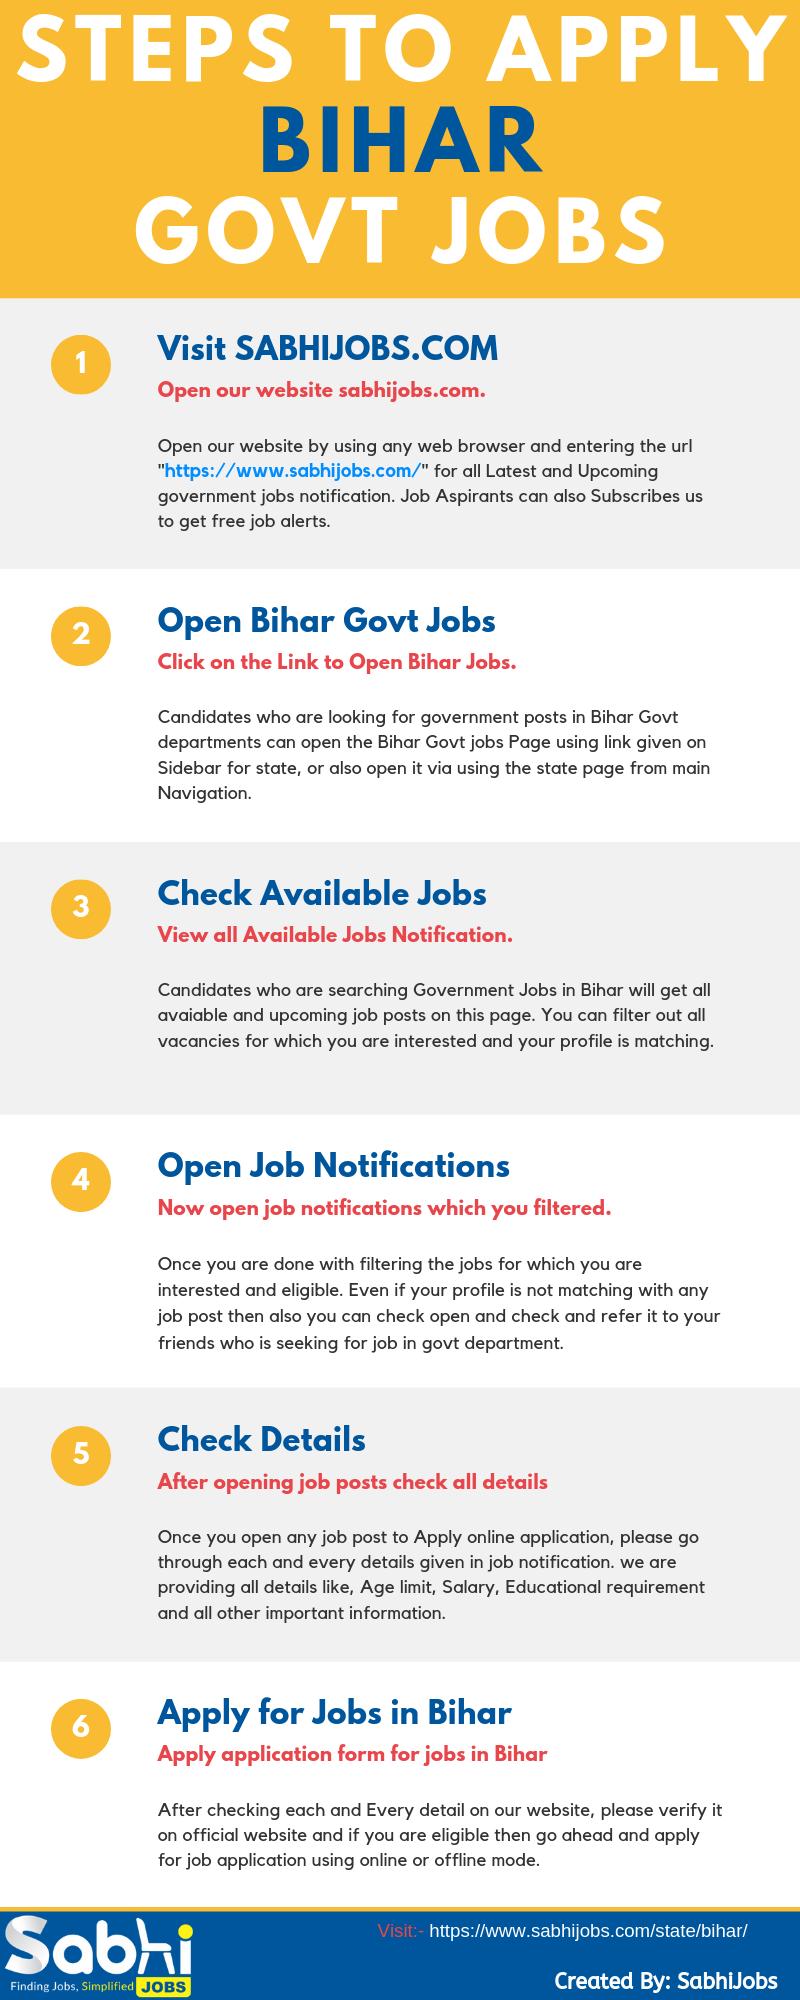 sarkari naukri in Bihar govt jobs 2019-20